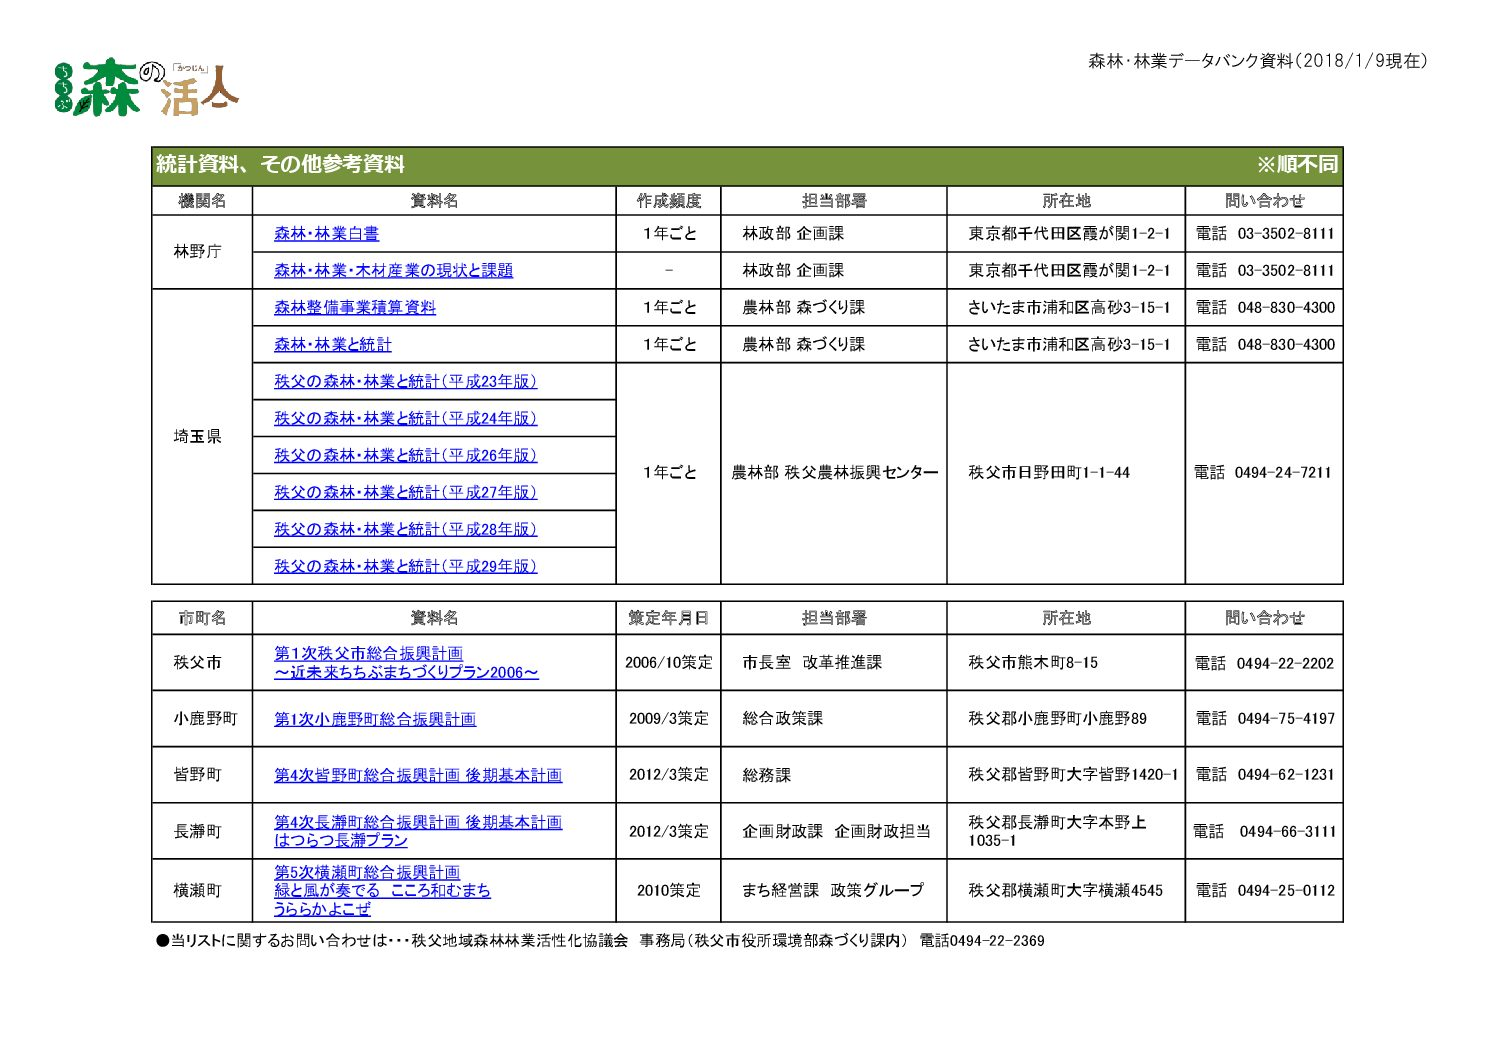 shiryo20180109